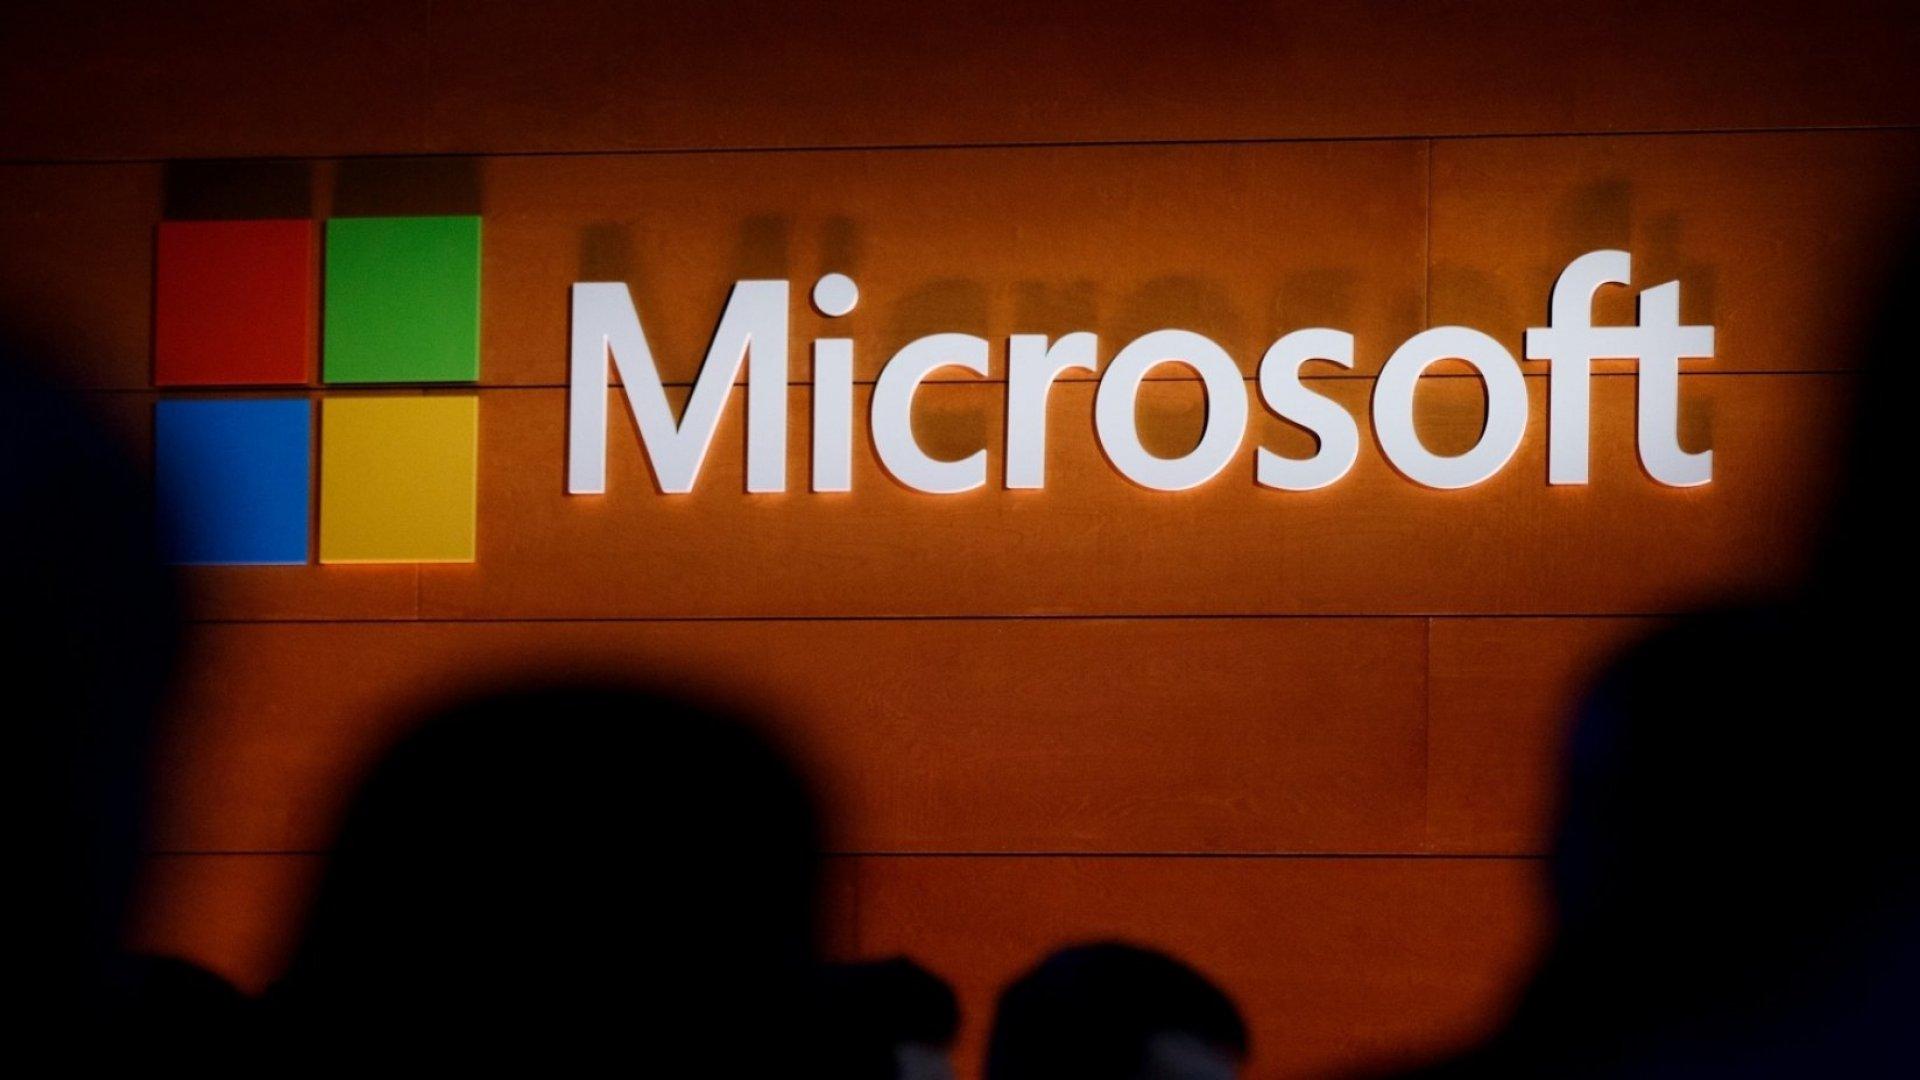 Microsoft Browser Fails During Microsoft Cloud Demo--So Presenter Downloads Google Chrome